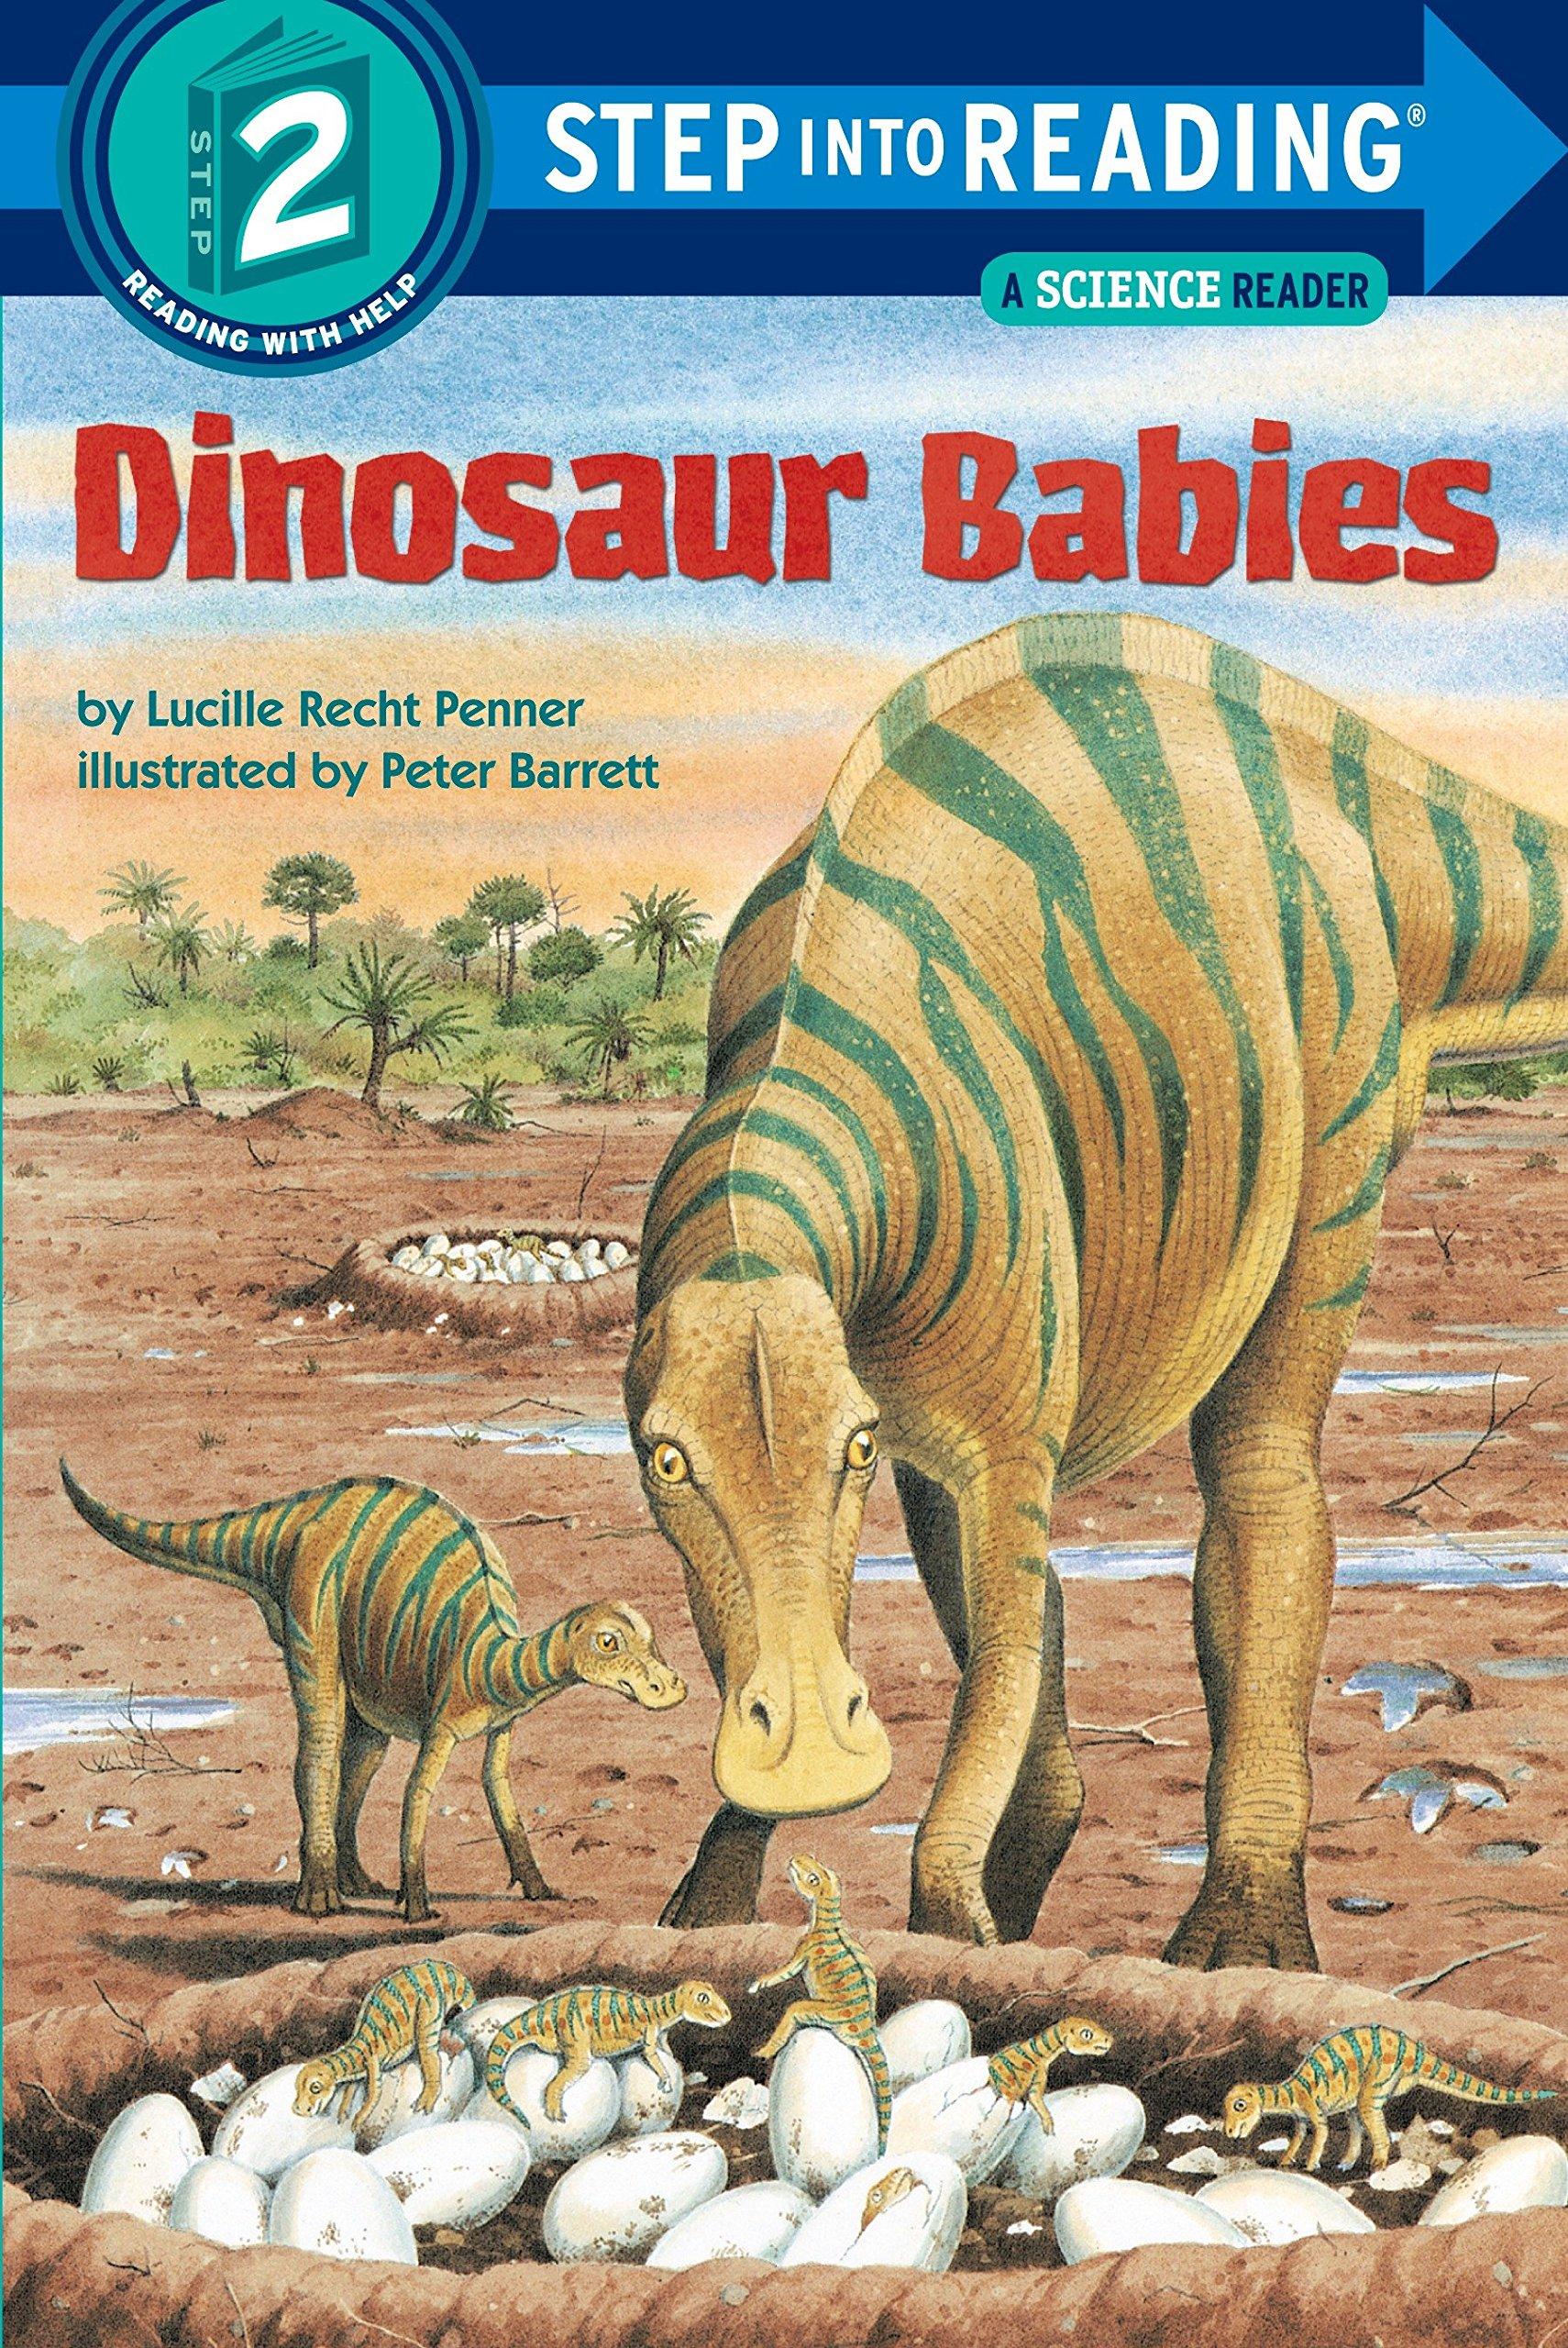 Dinosaur Babies (Step-into-Reading: A Step 2 Book) Paperback – August 20, 1991 Lucille Recht Penner Peter Barrett 0679812075 Animals - Infancy